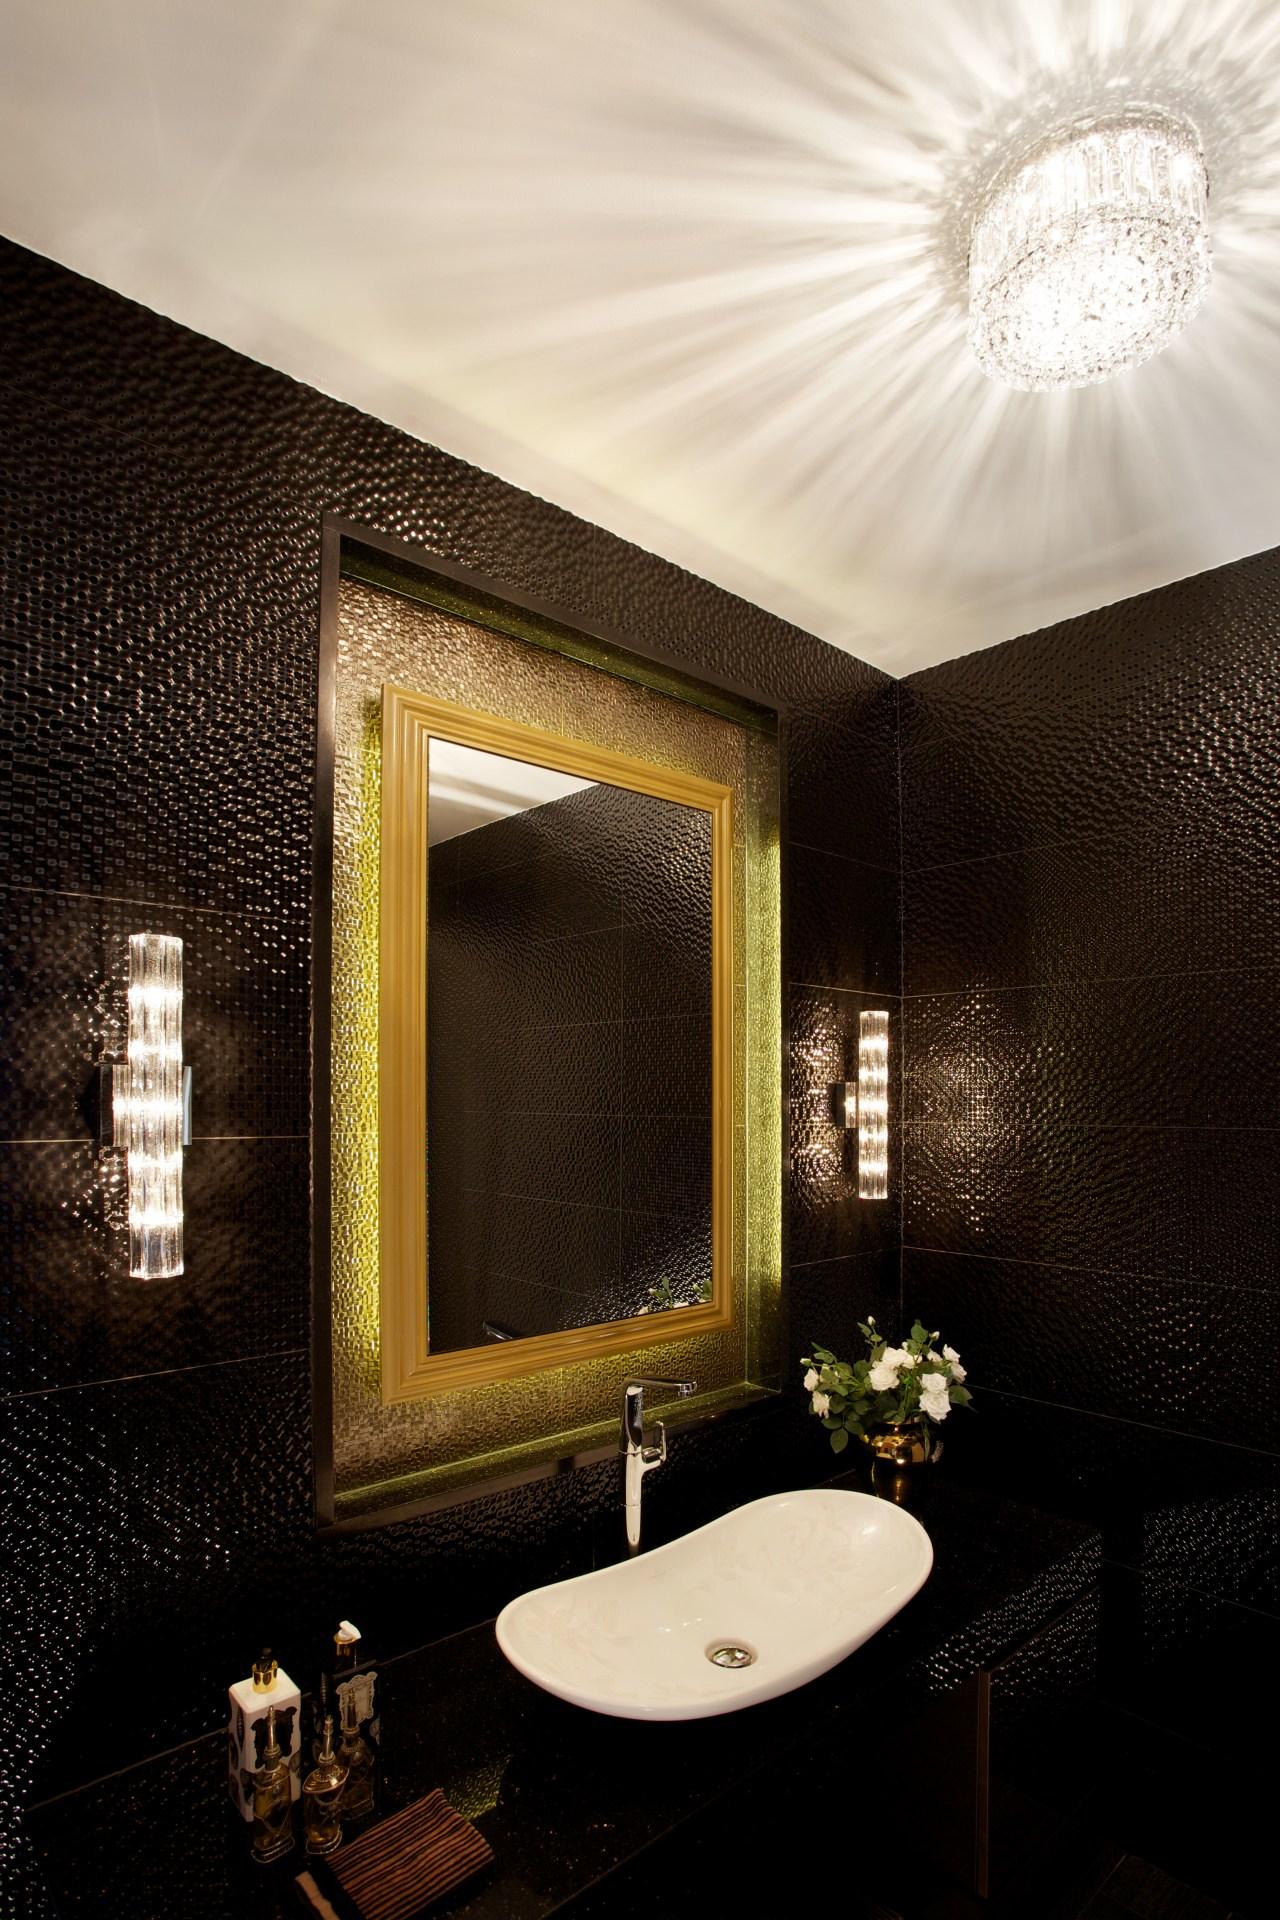 Powder room by architect Henry Lin bathroom, ceiling, daylighting, interior design, light fixture, lighting, room, wall, black, white